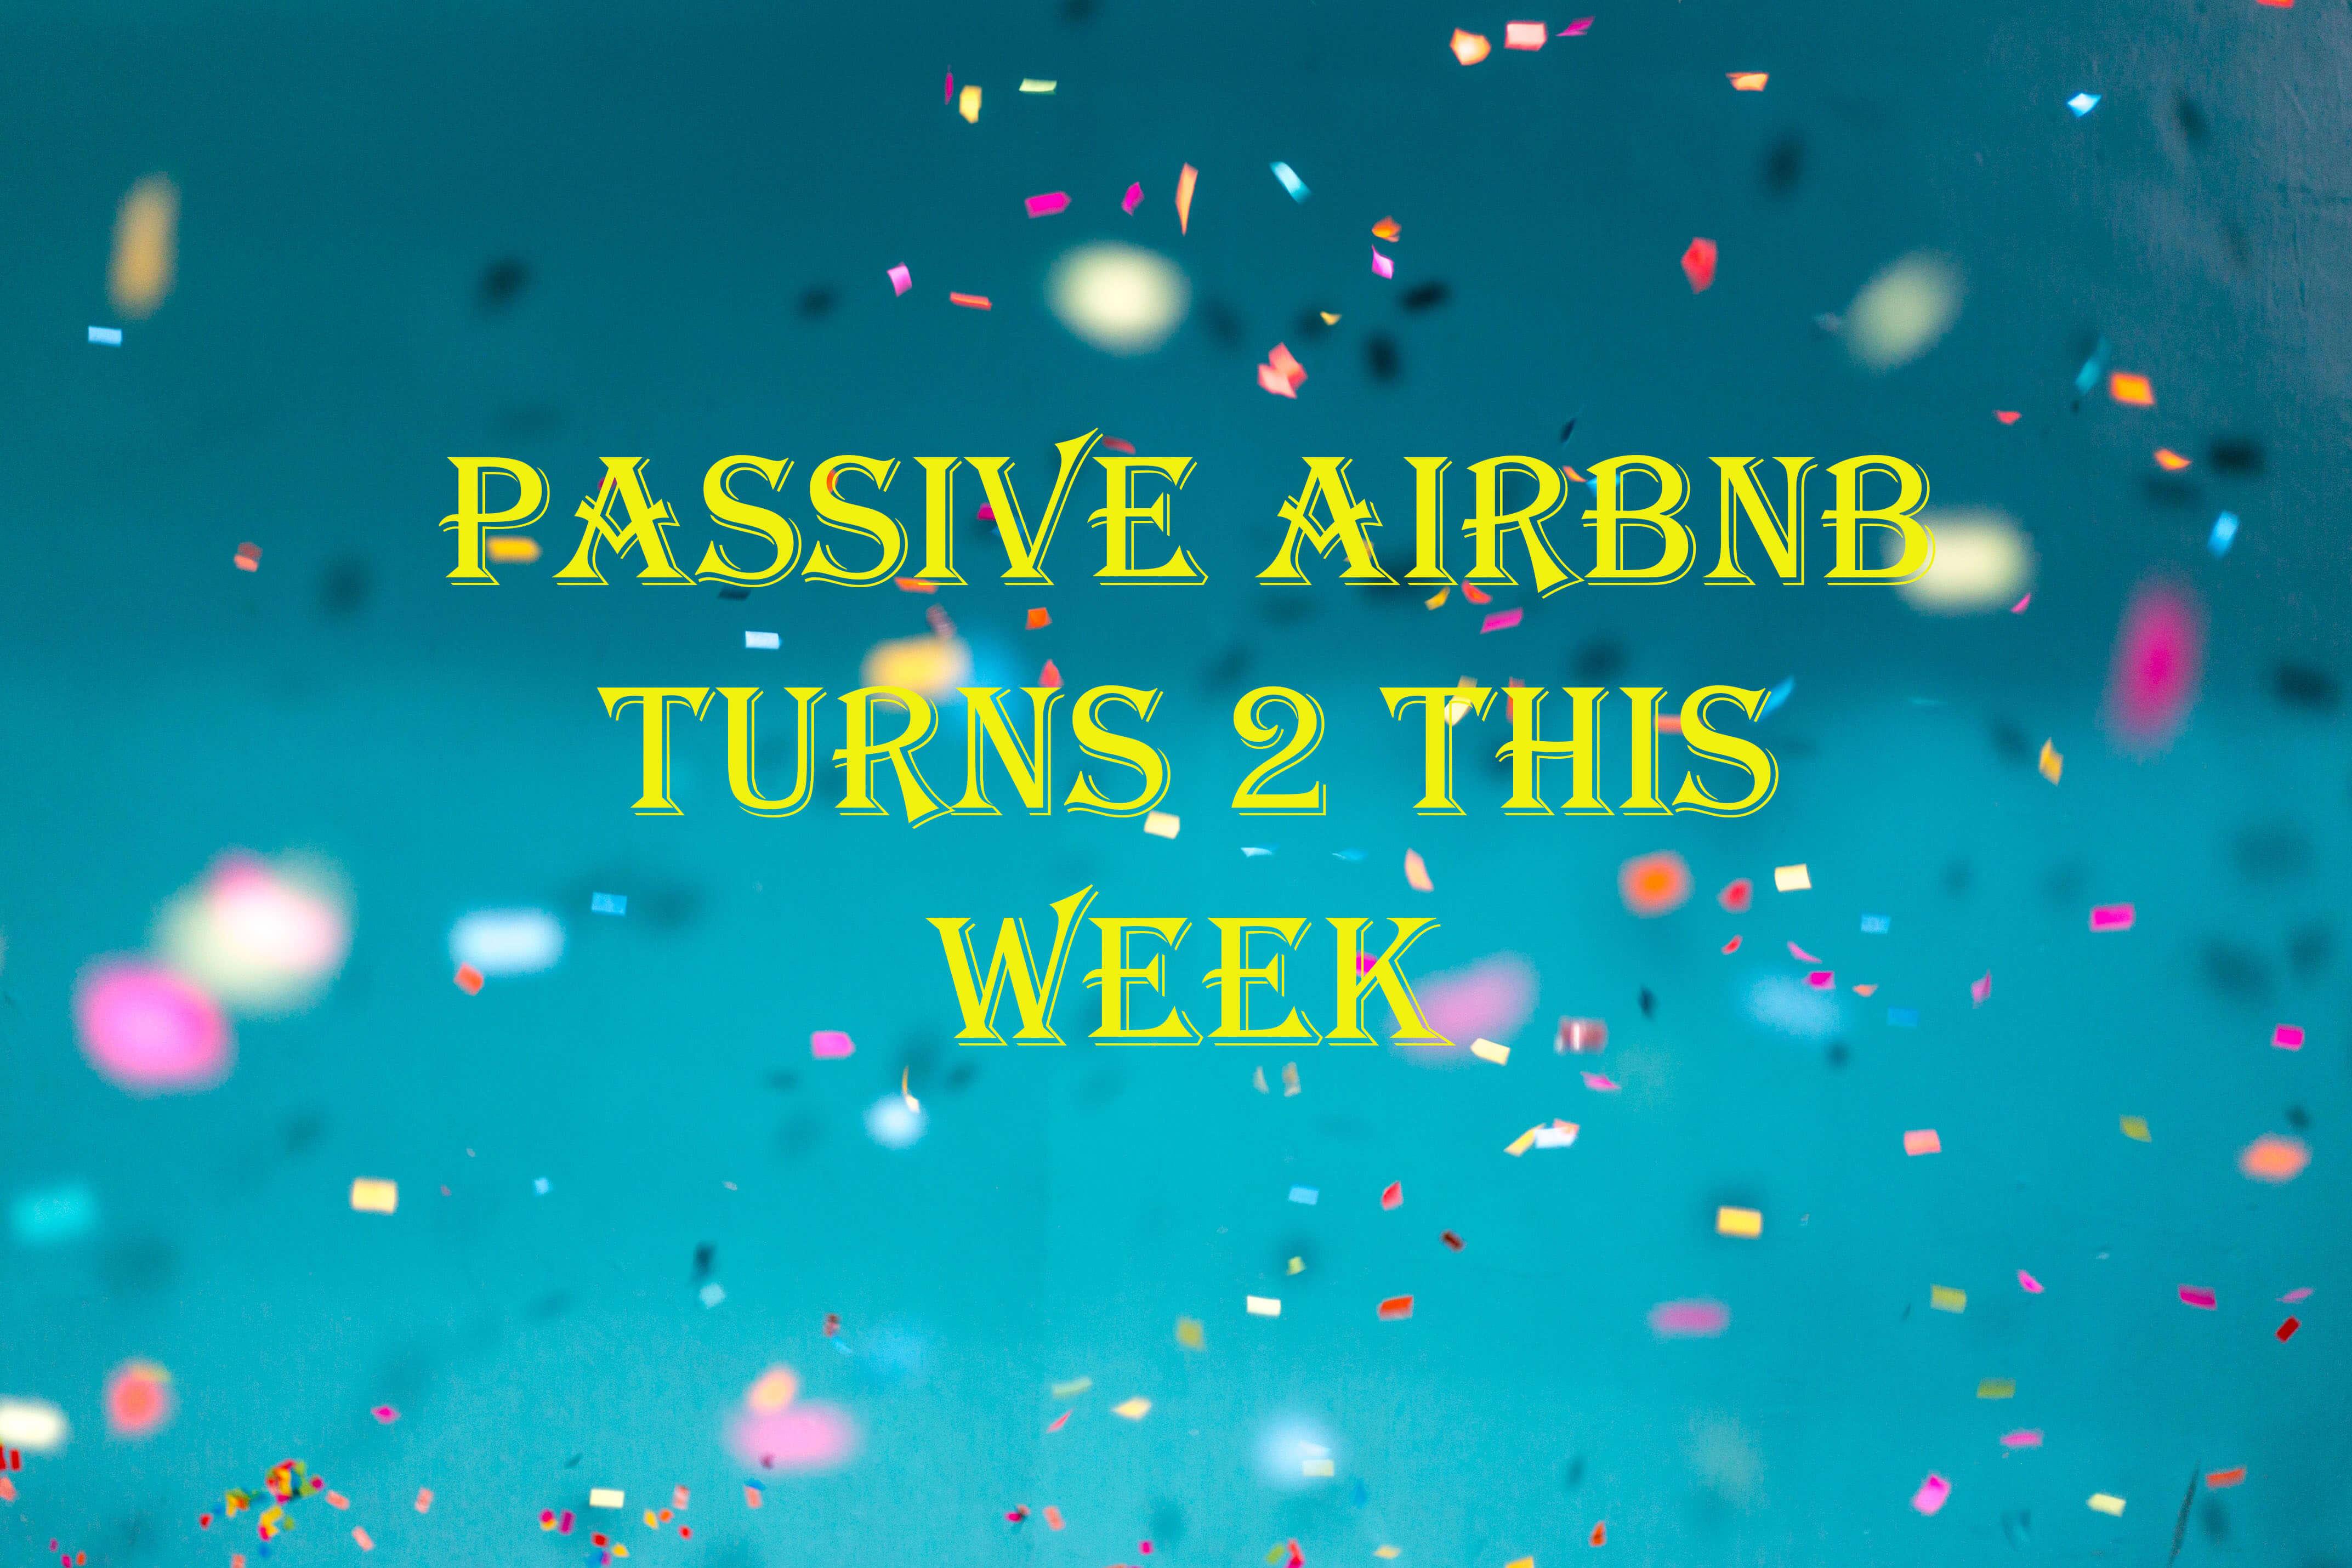 Passive Airbnb Turns 2